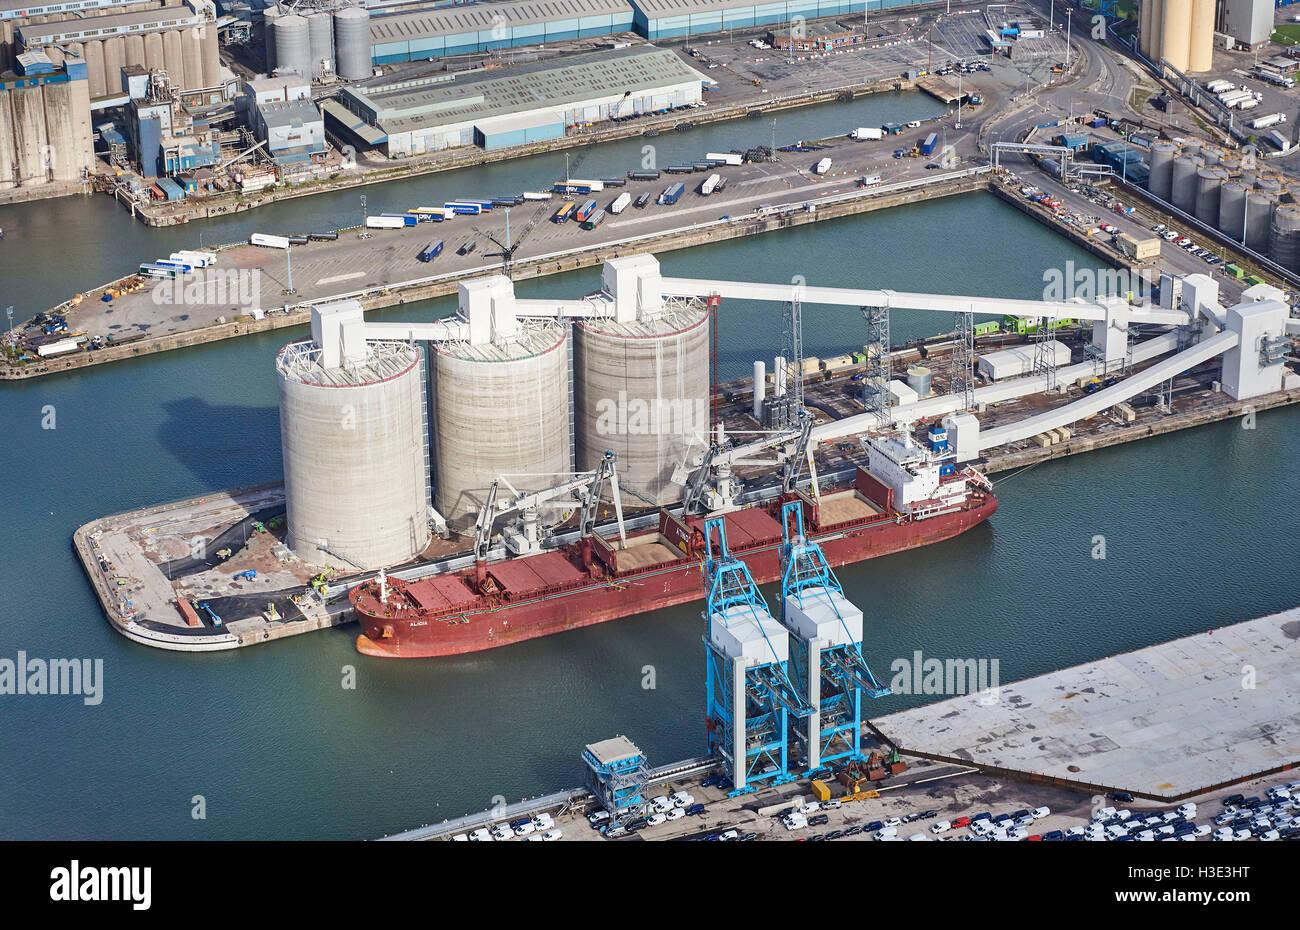 Biomass import facility, Seaforth Docks, Liverpool, NW England - Stock Image